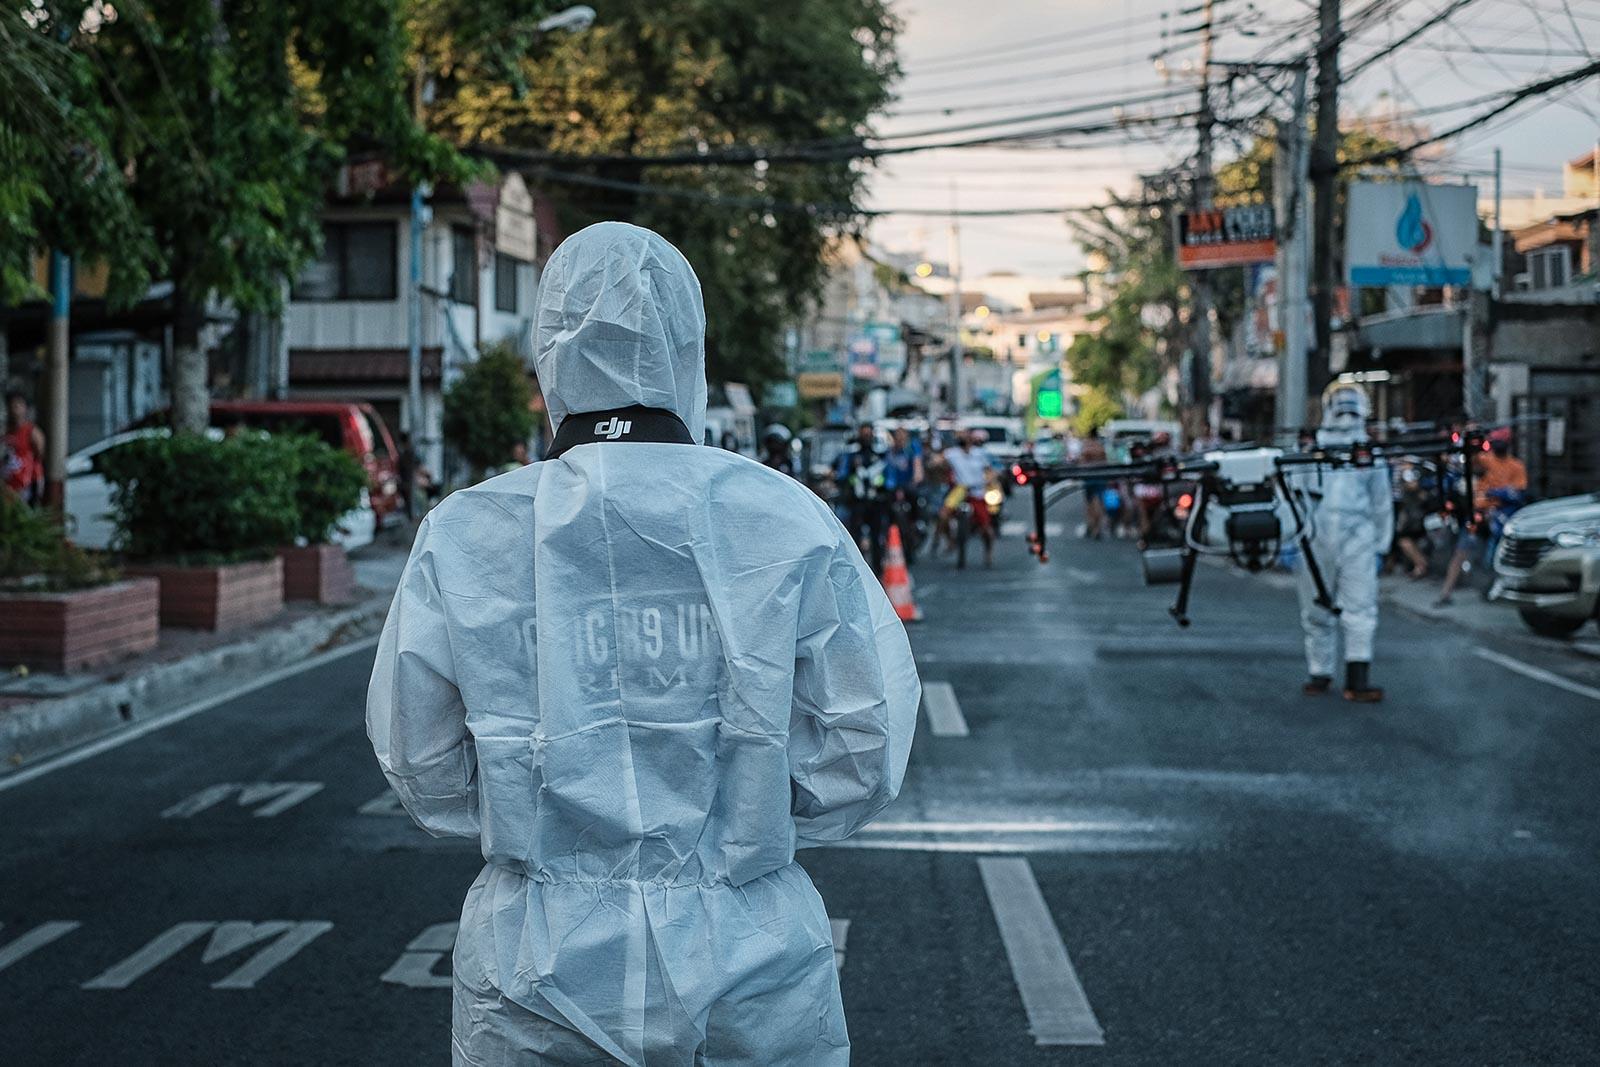 Pasig reports 41 total coronavirus cases, 7 deaths